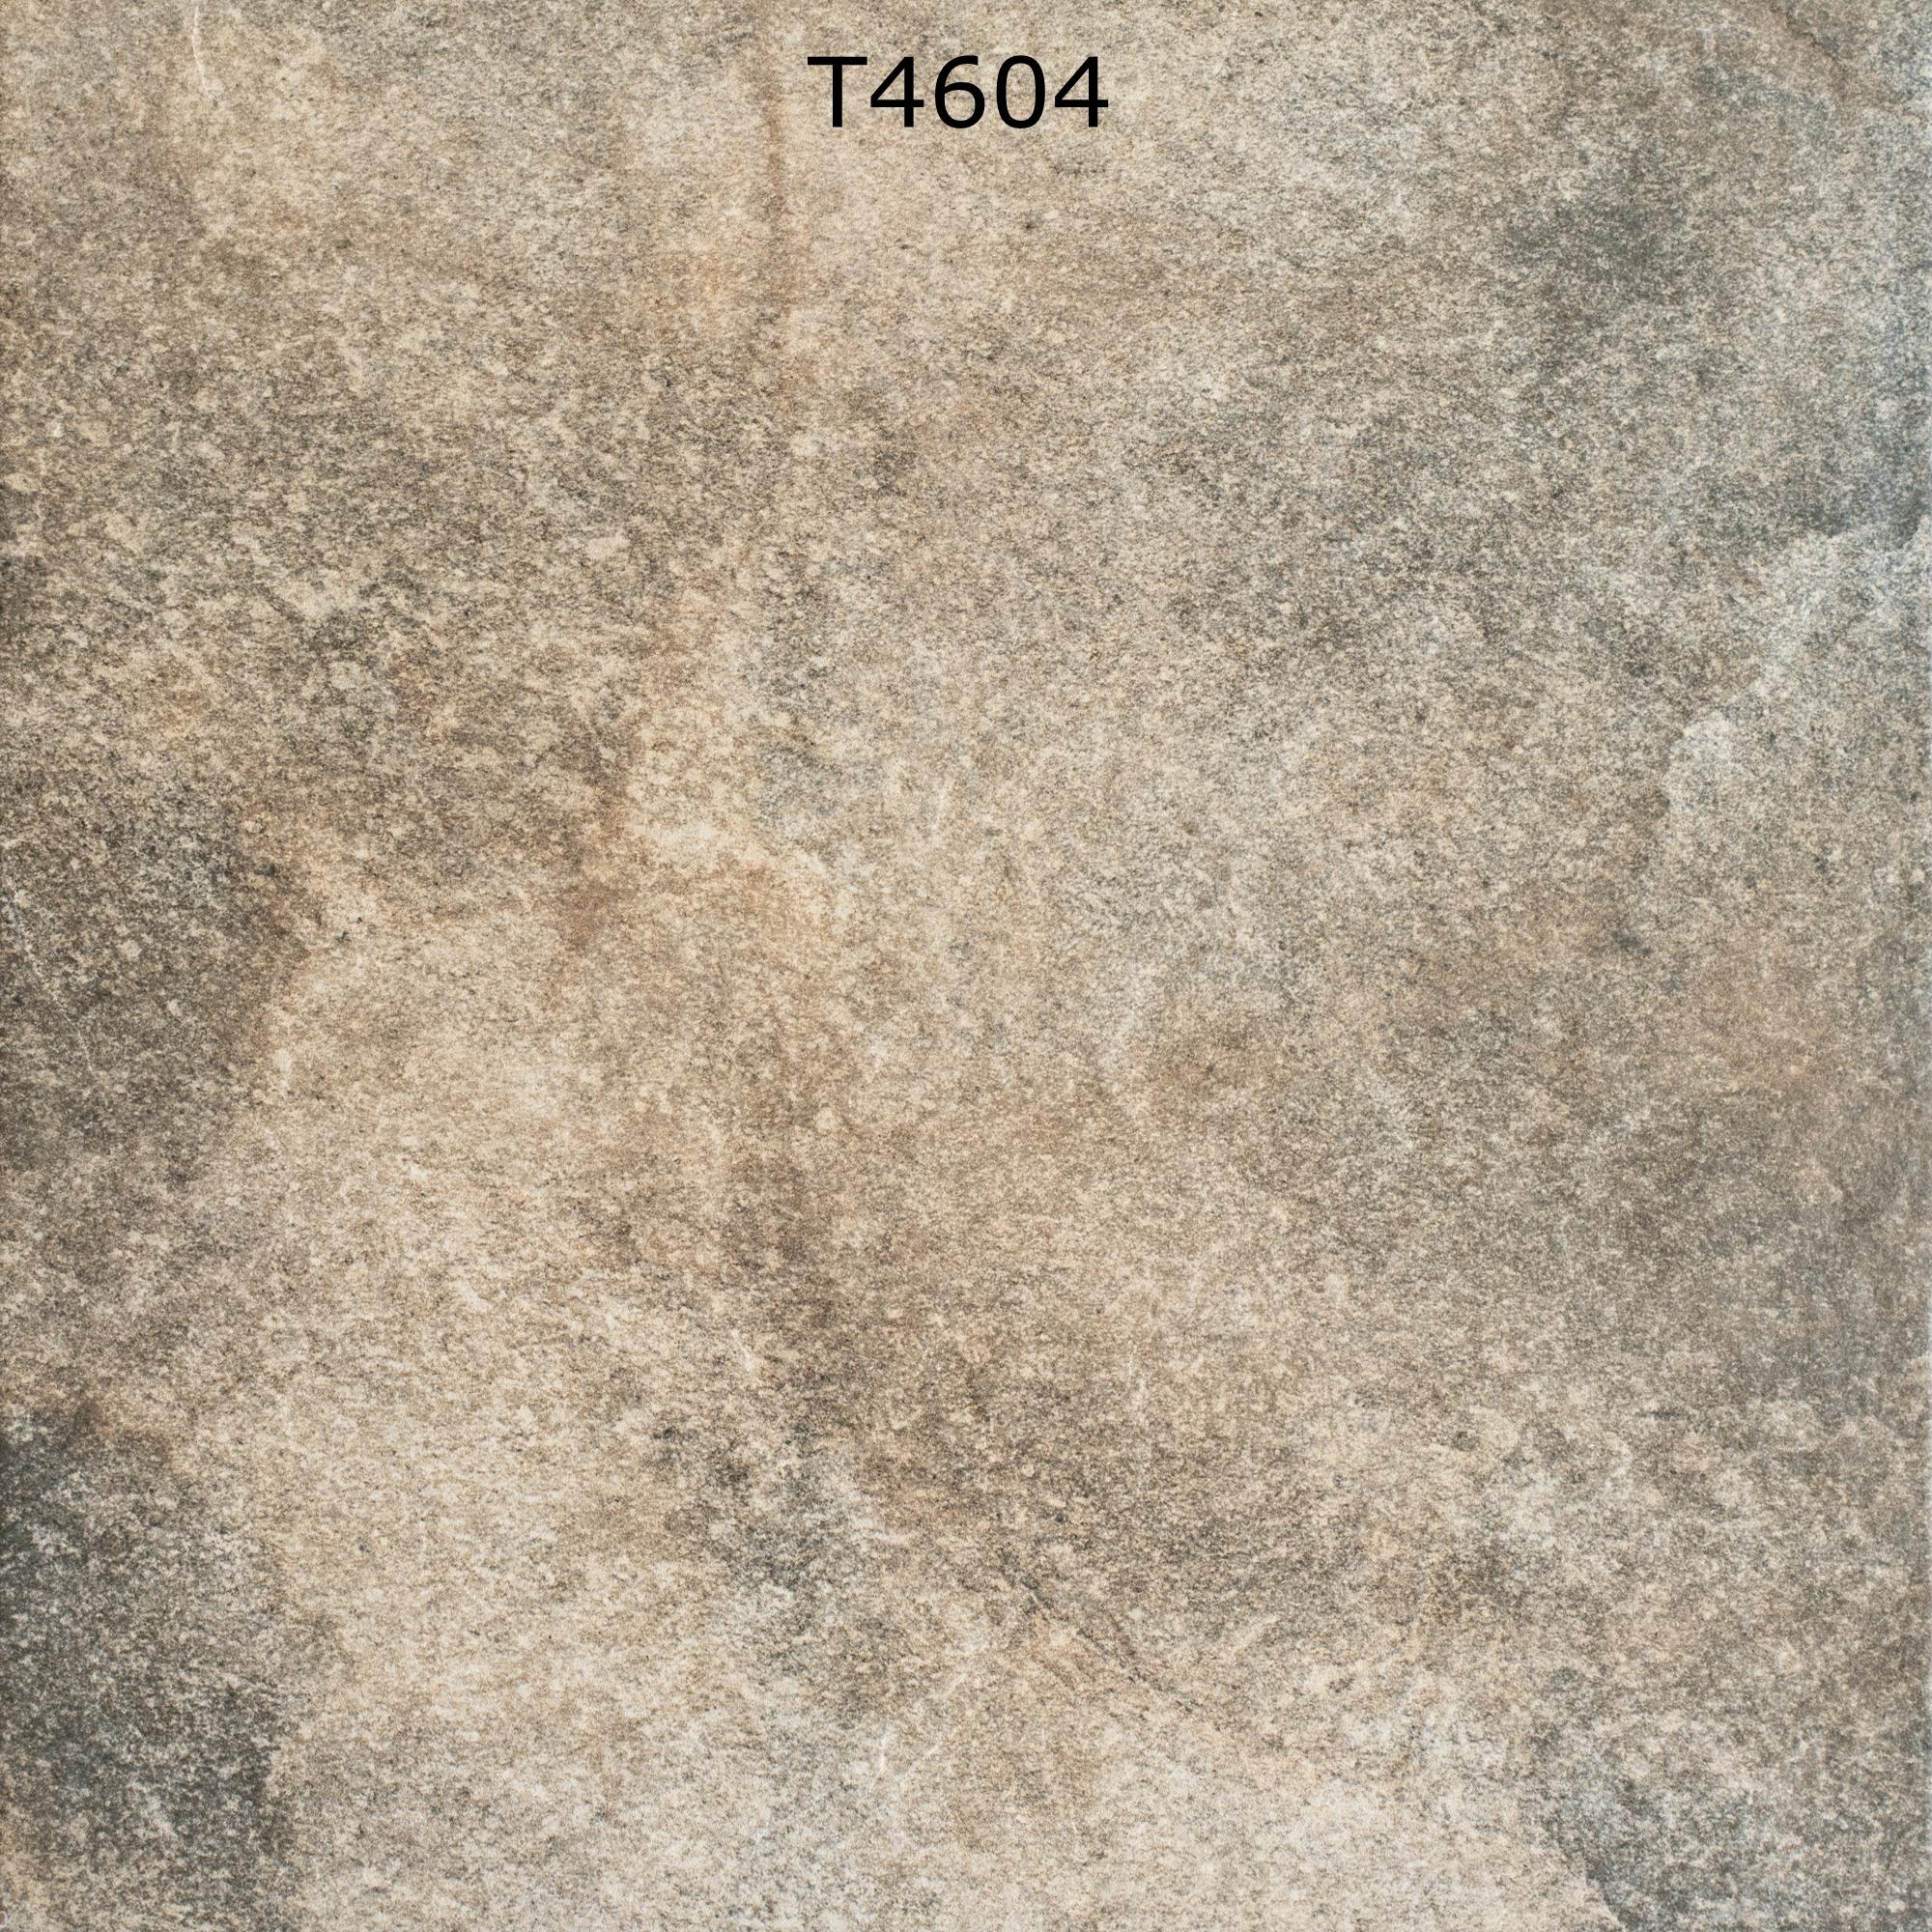 T4604